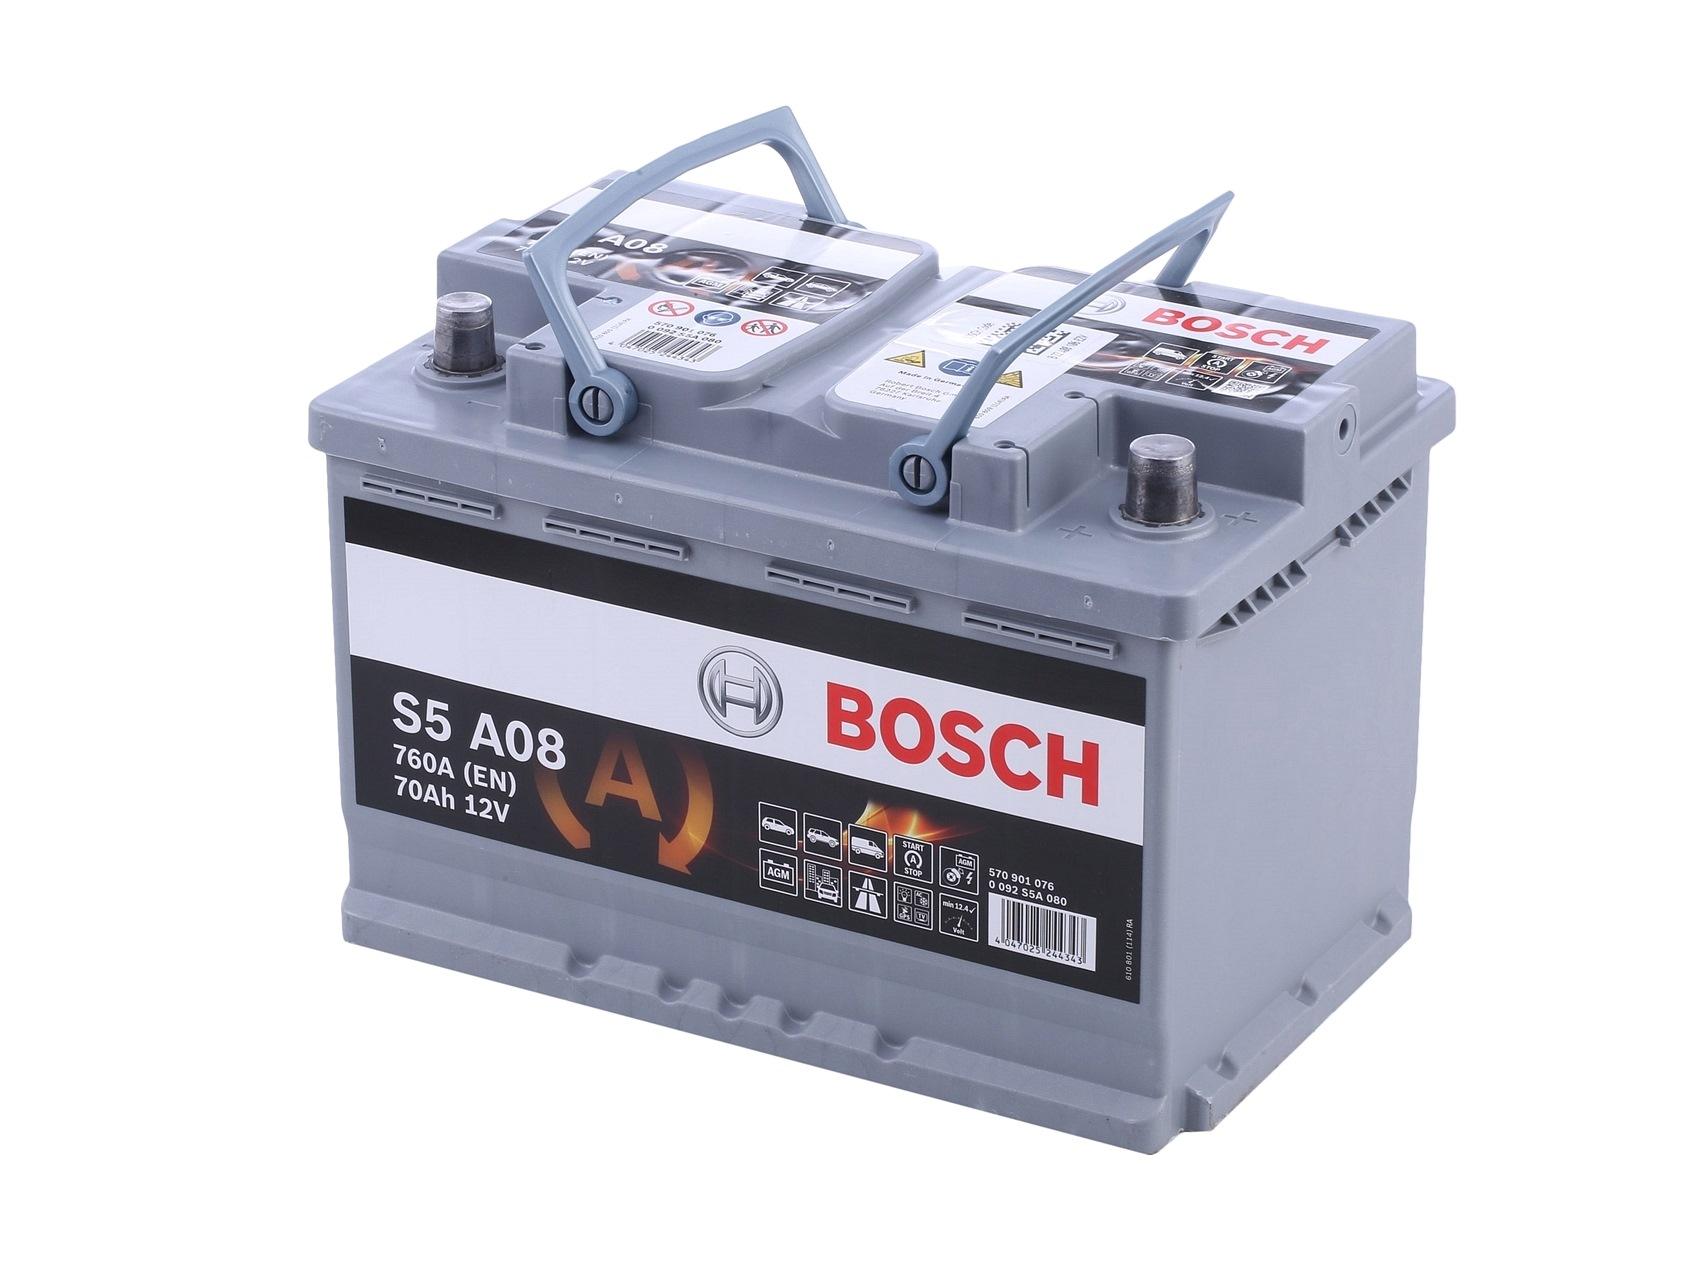 Batteria 0 092 S5A 080 acquista online 24/7